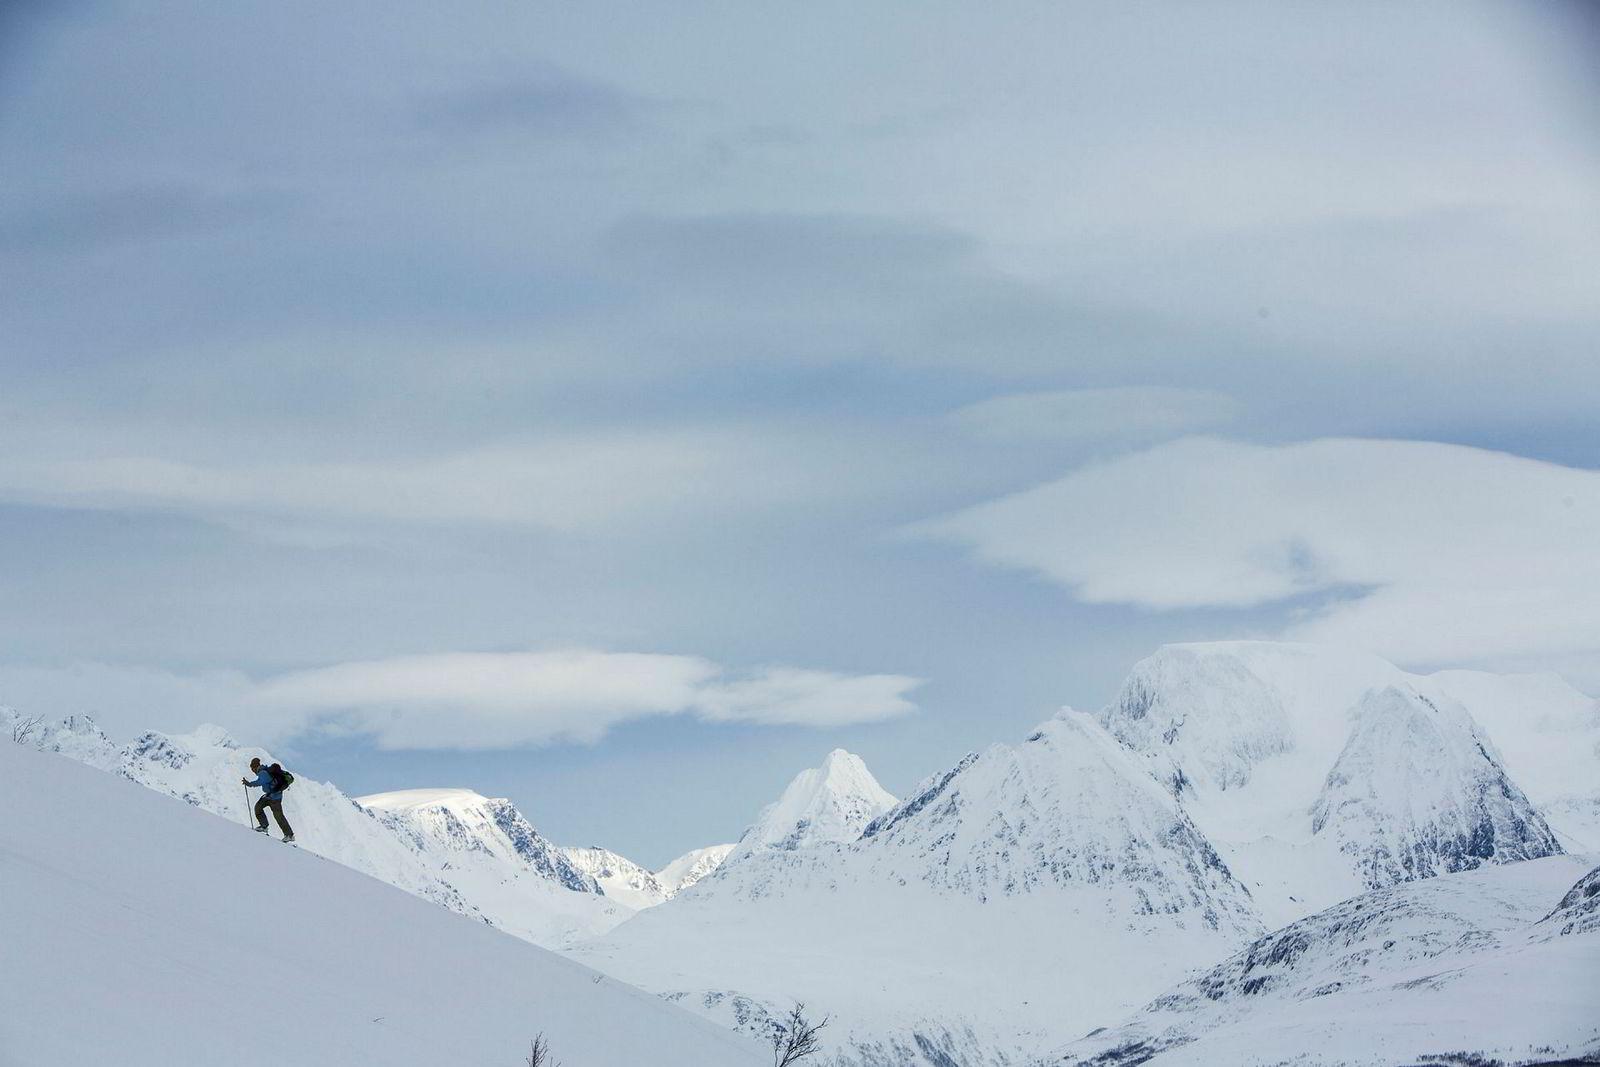 Jens-Egil Nysæther nytter gjerne blåtimen til en skitur.